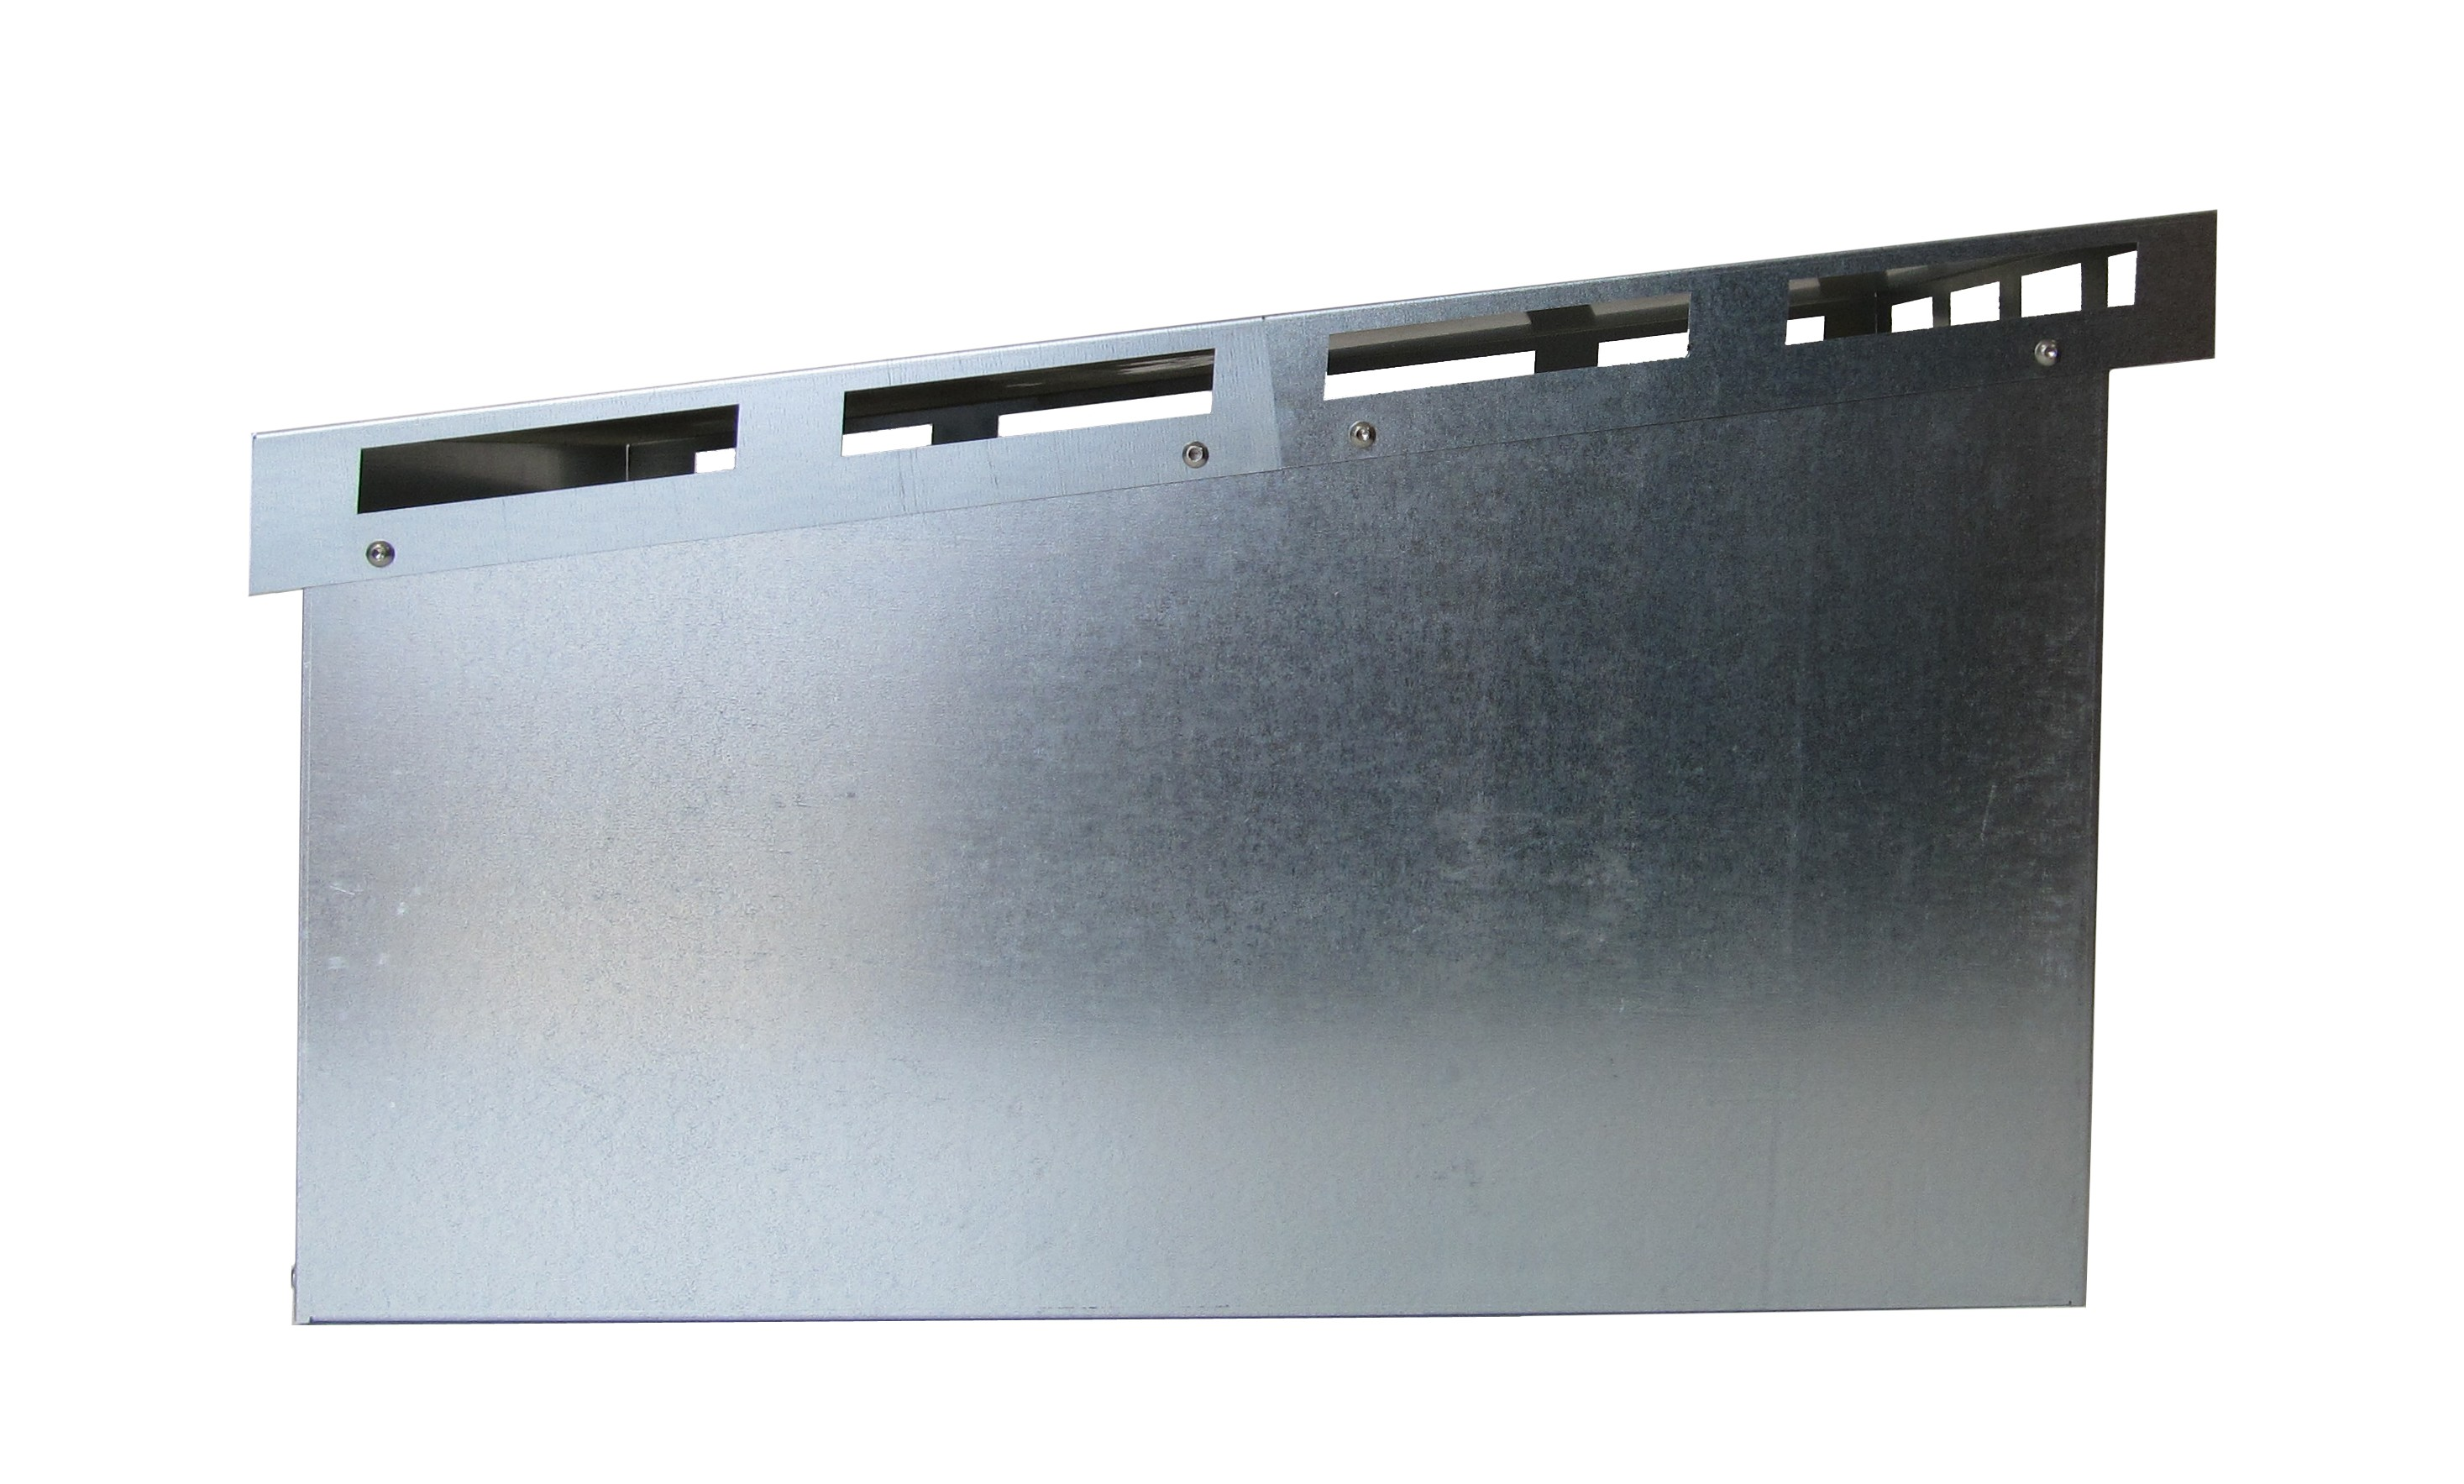 Mähroboter Garage Bio I ediGarden Stahl silber 62x77x44cm Bild 2